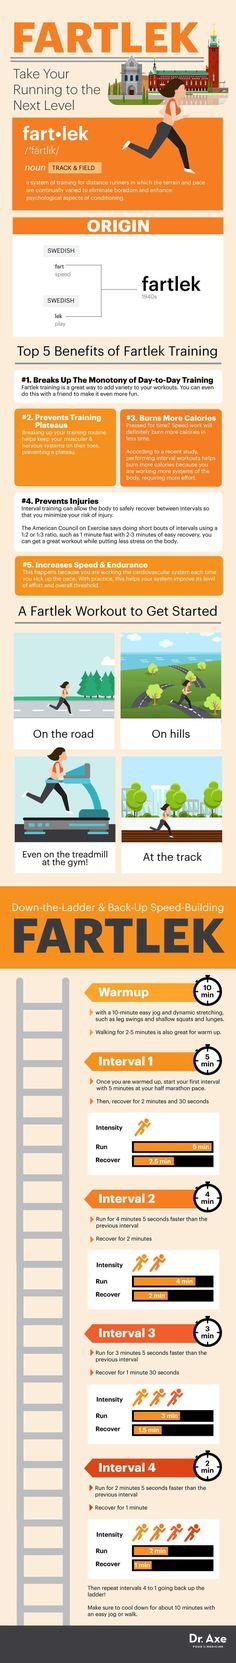 Fartlek: A Swedish Training Trick for Better Running - Dr. Axe #trailrunning